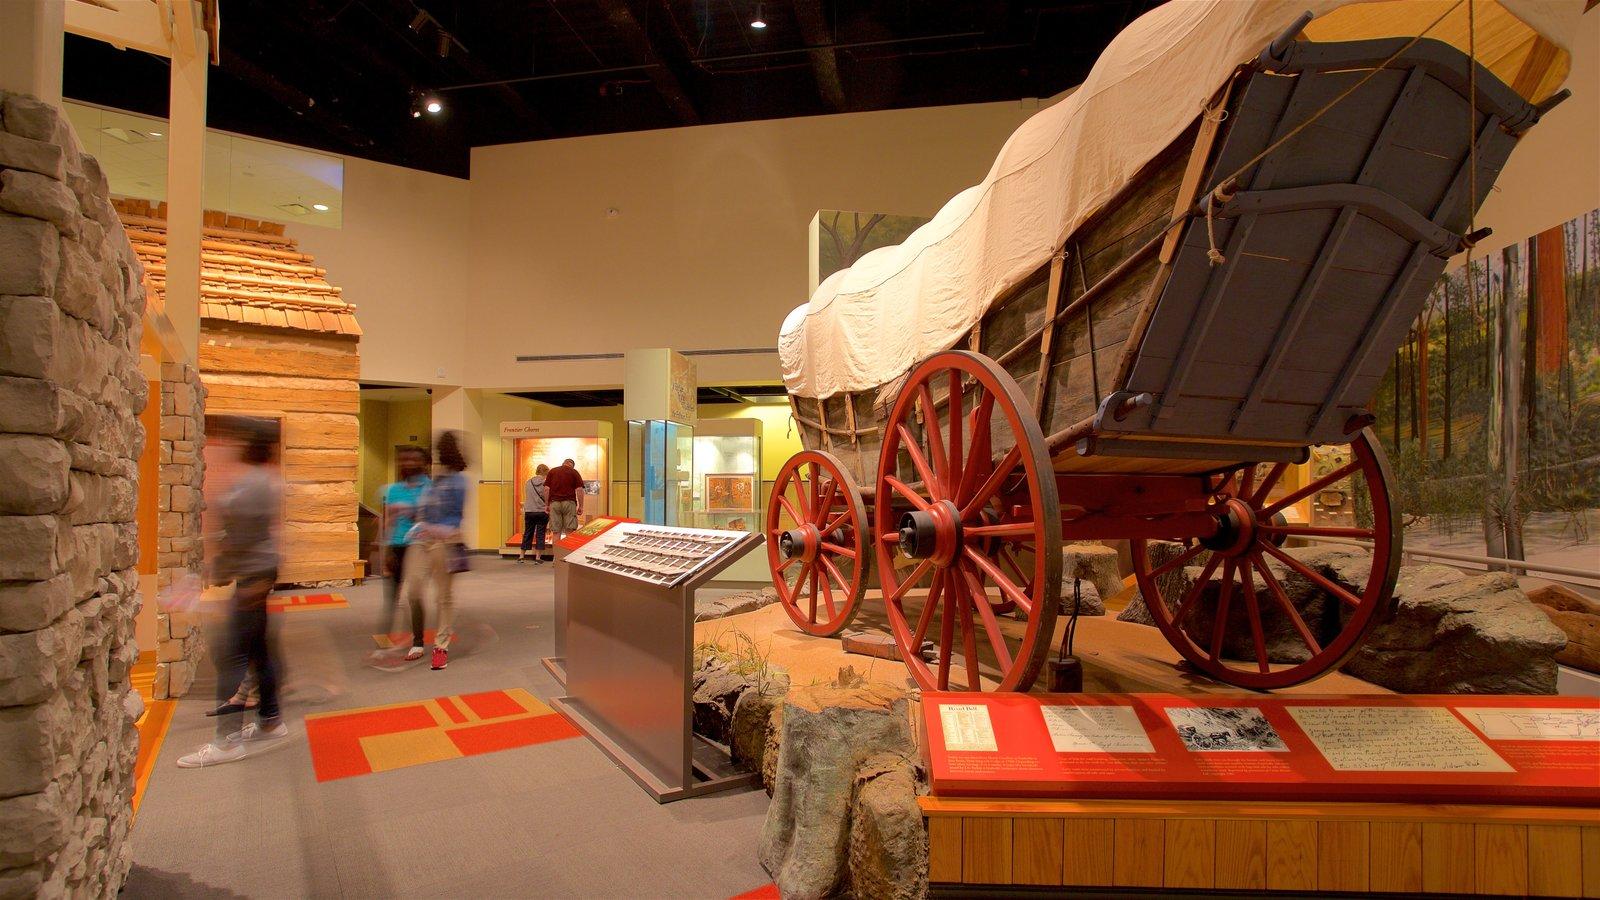 Tennessee State Museum que incluye vistas interiores